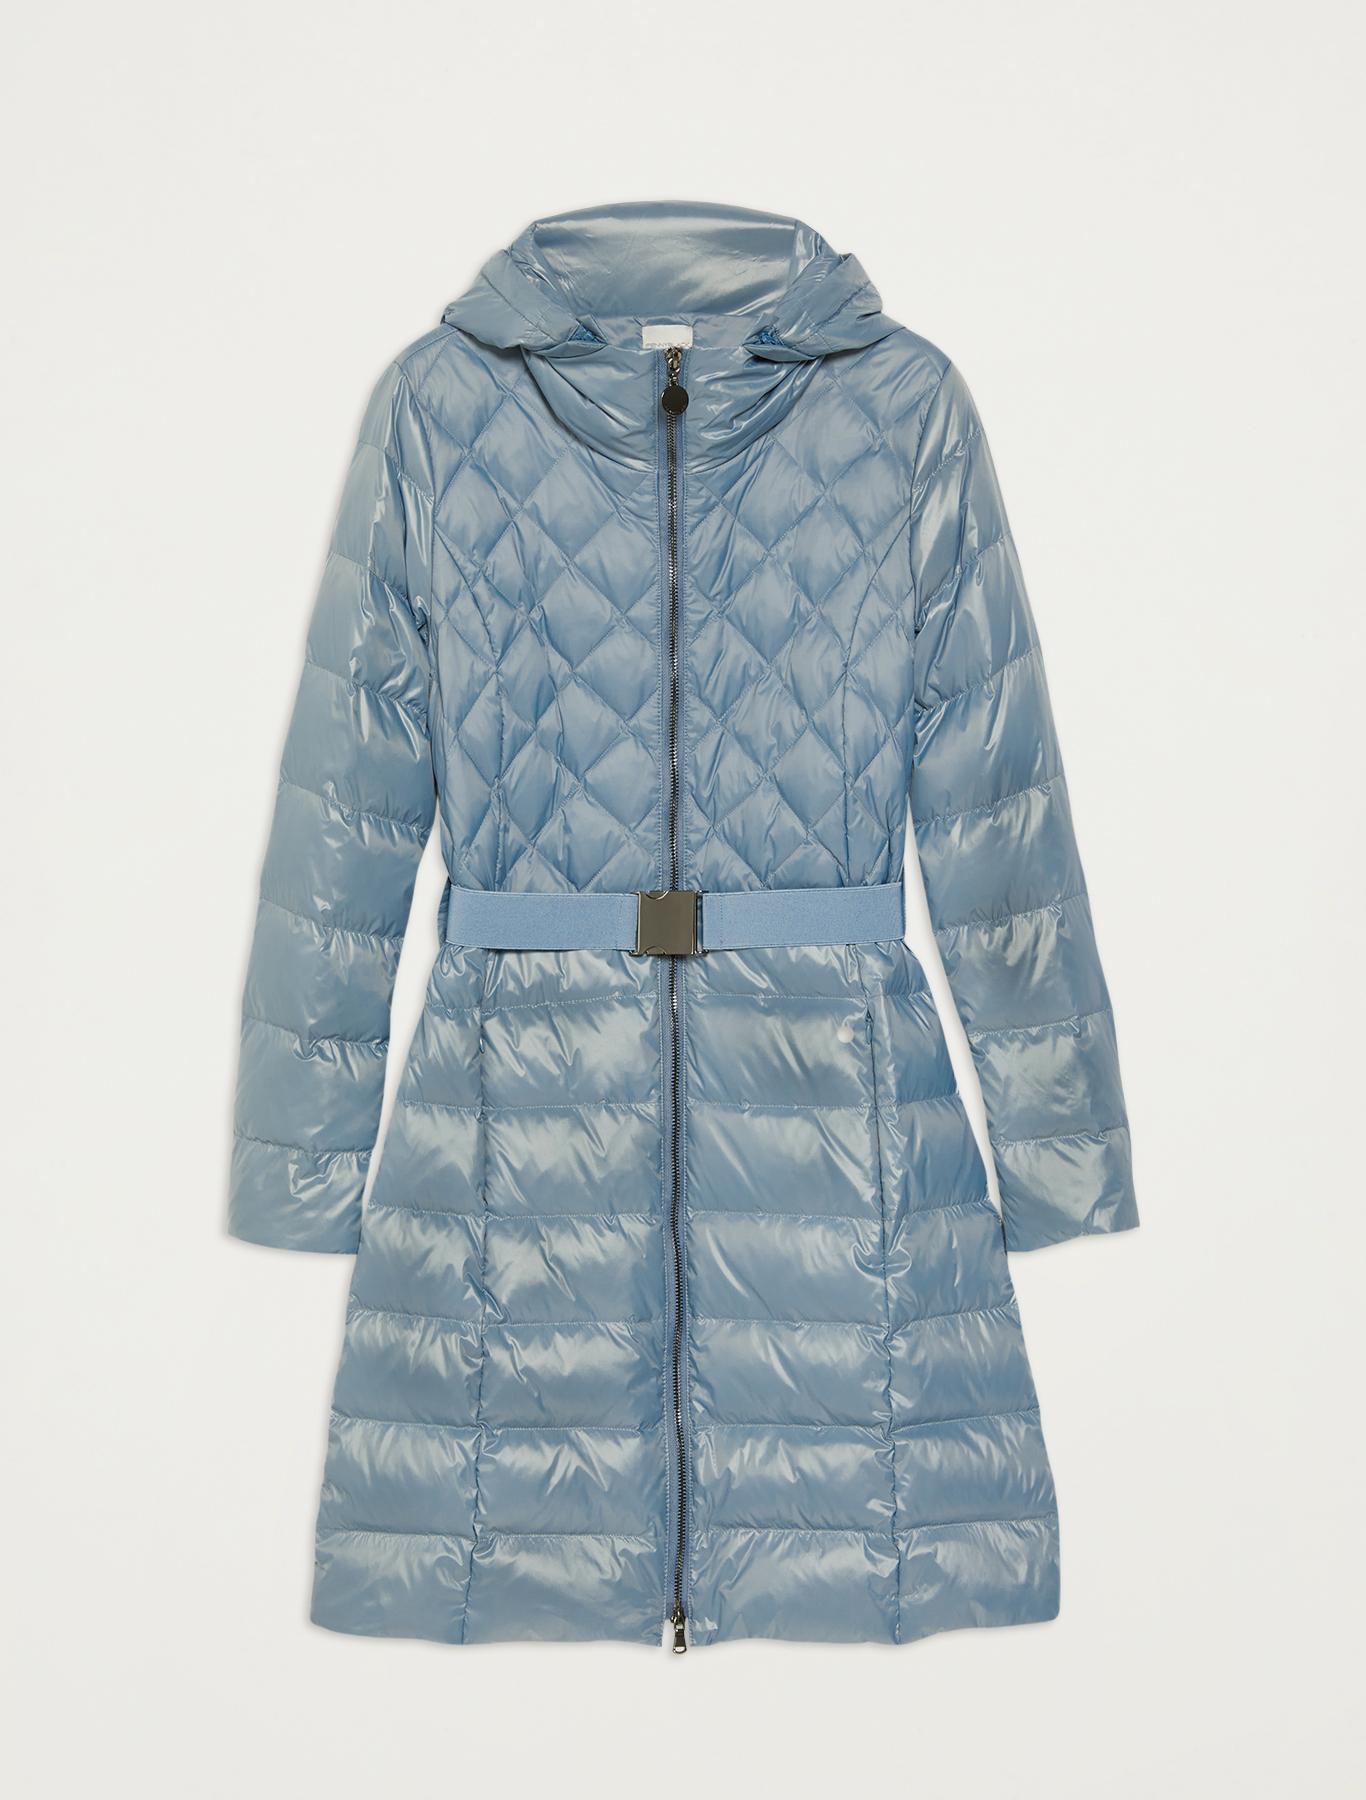 Matt-glossy belted down jacket - light blue - pennyblack